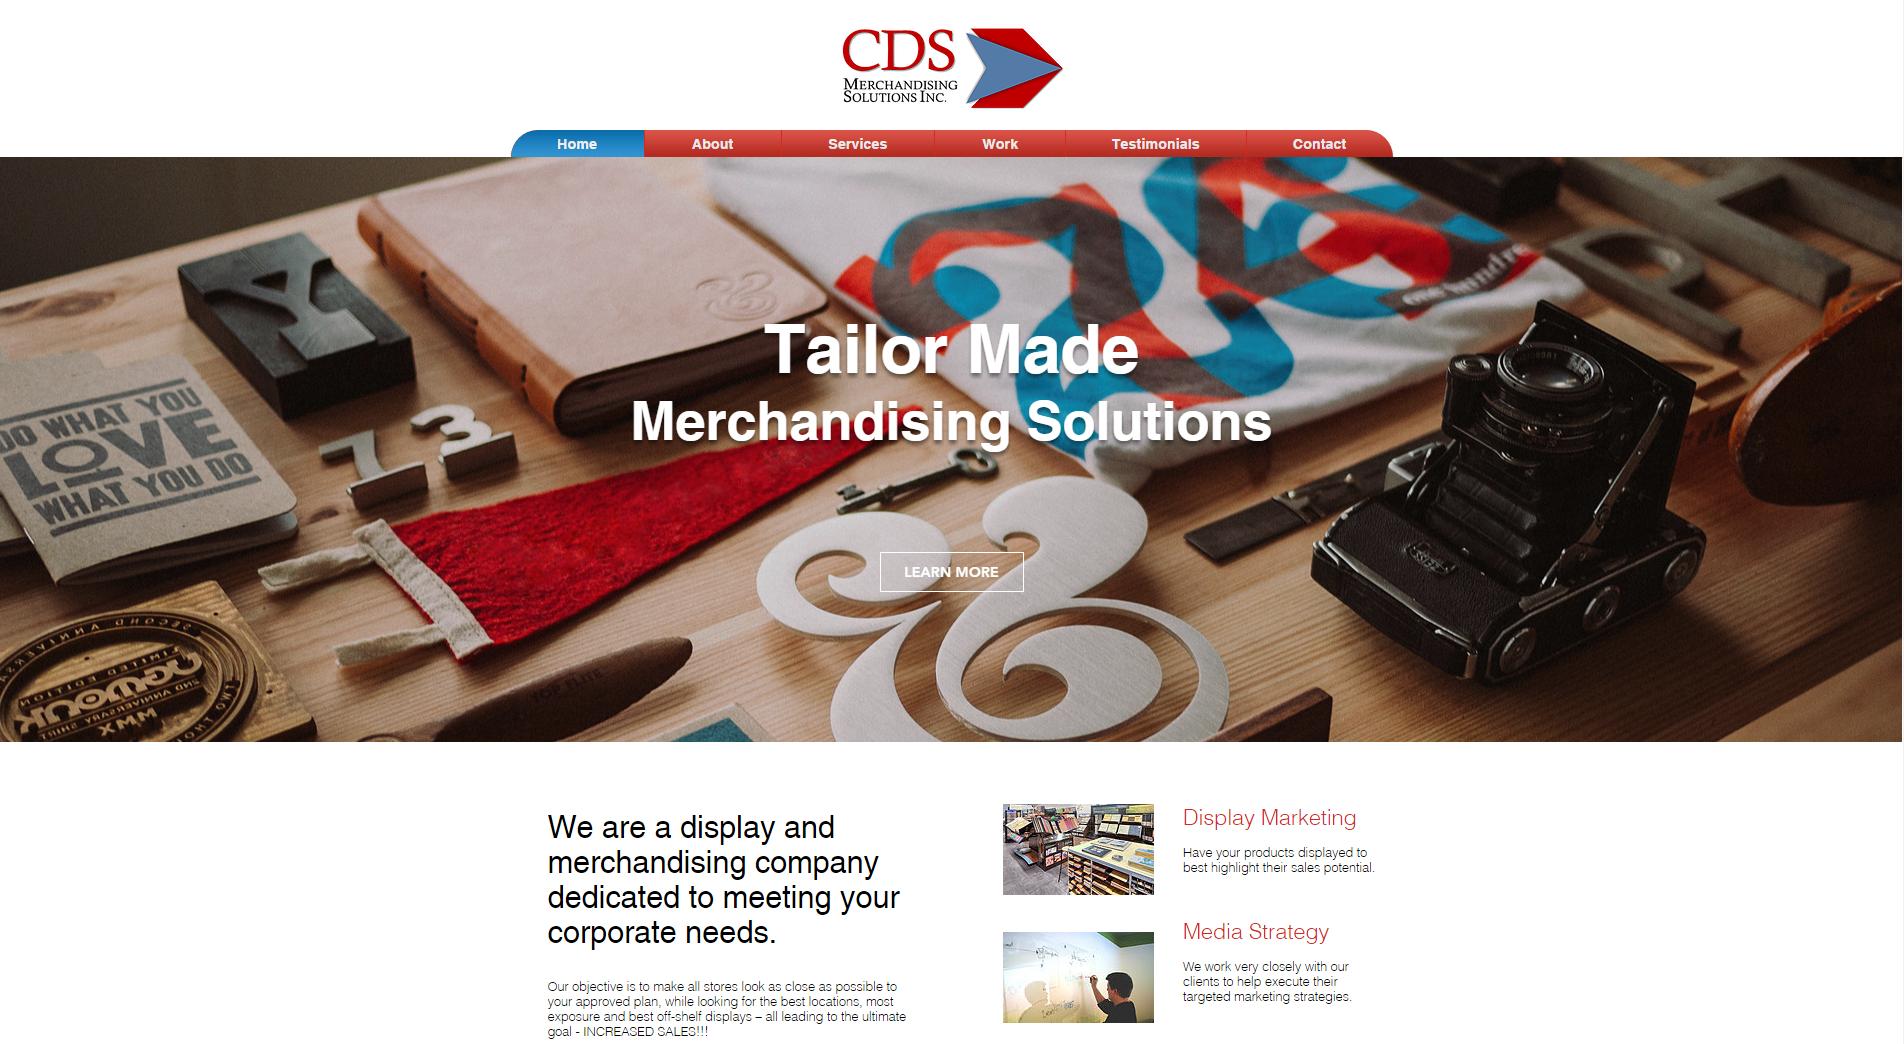 CDS Merchandising